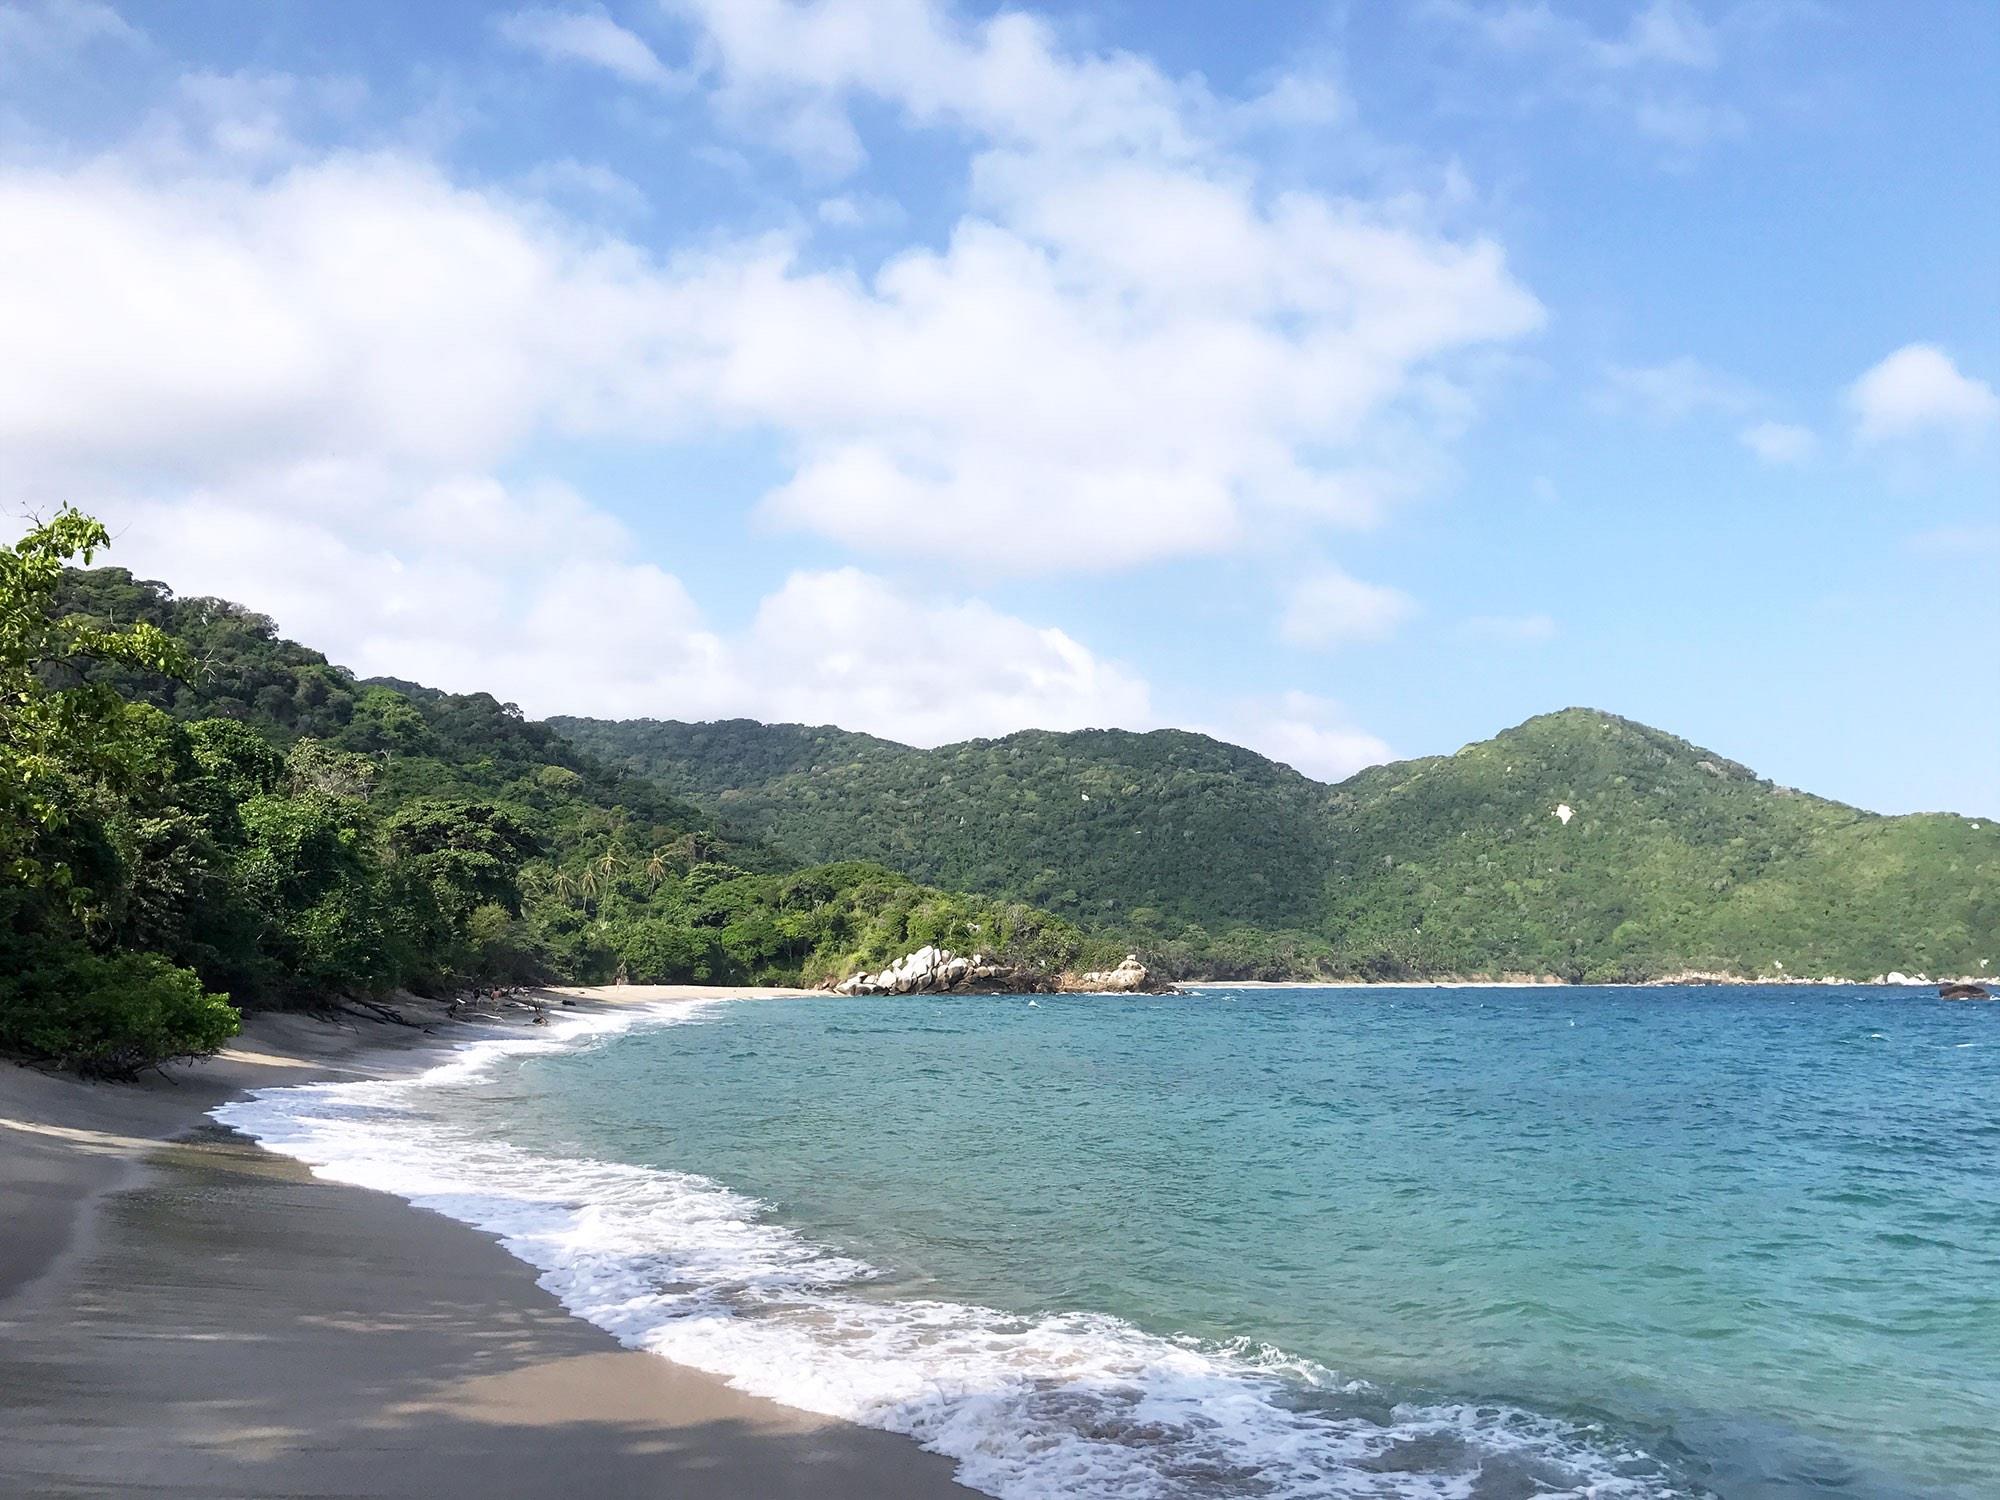 Nudist Beach in Tayrona National Park